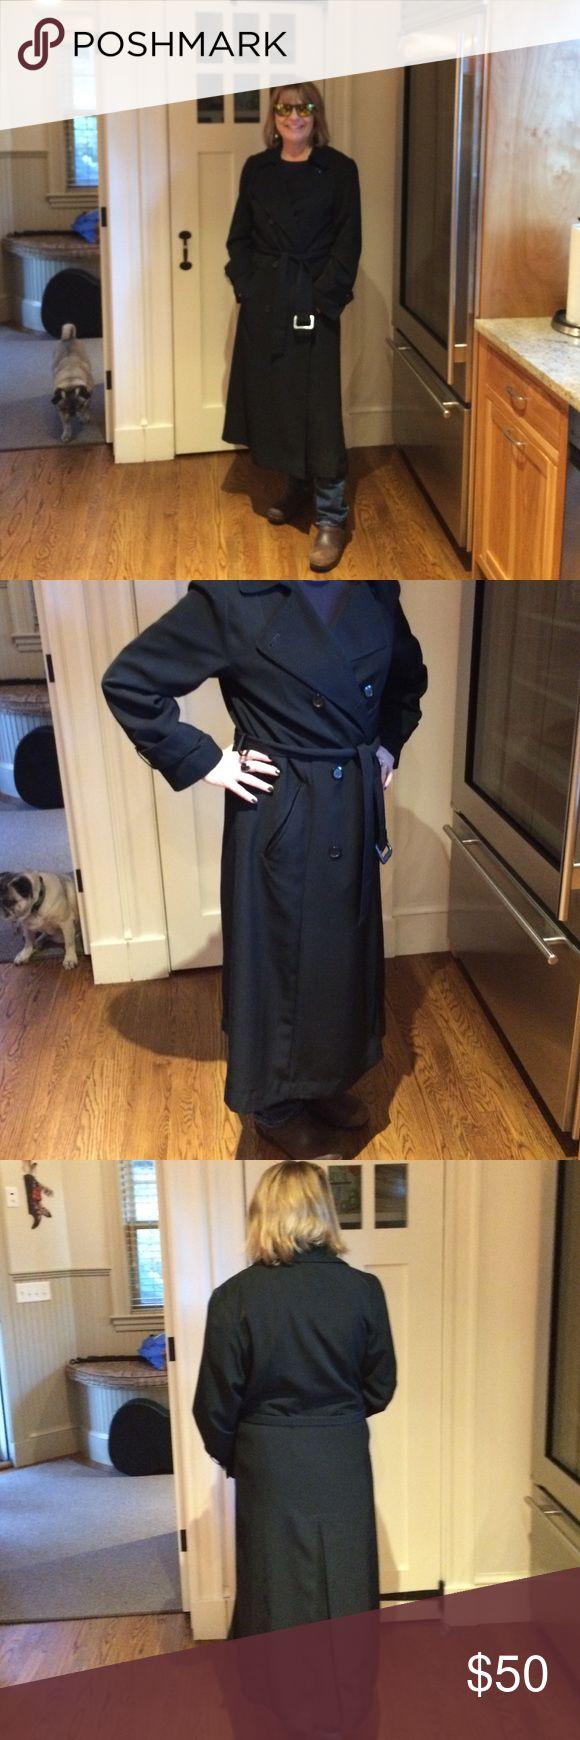 Black full length women's rain coat Double breasted , belt included, side pockets black womens rain coat. Gallery Jackets & Coats Trench Coats